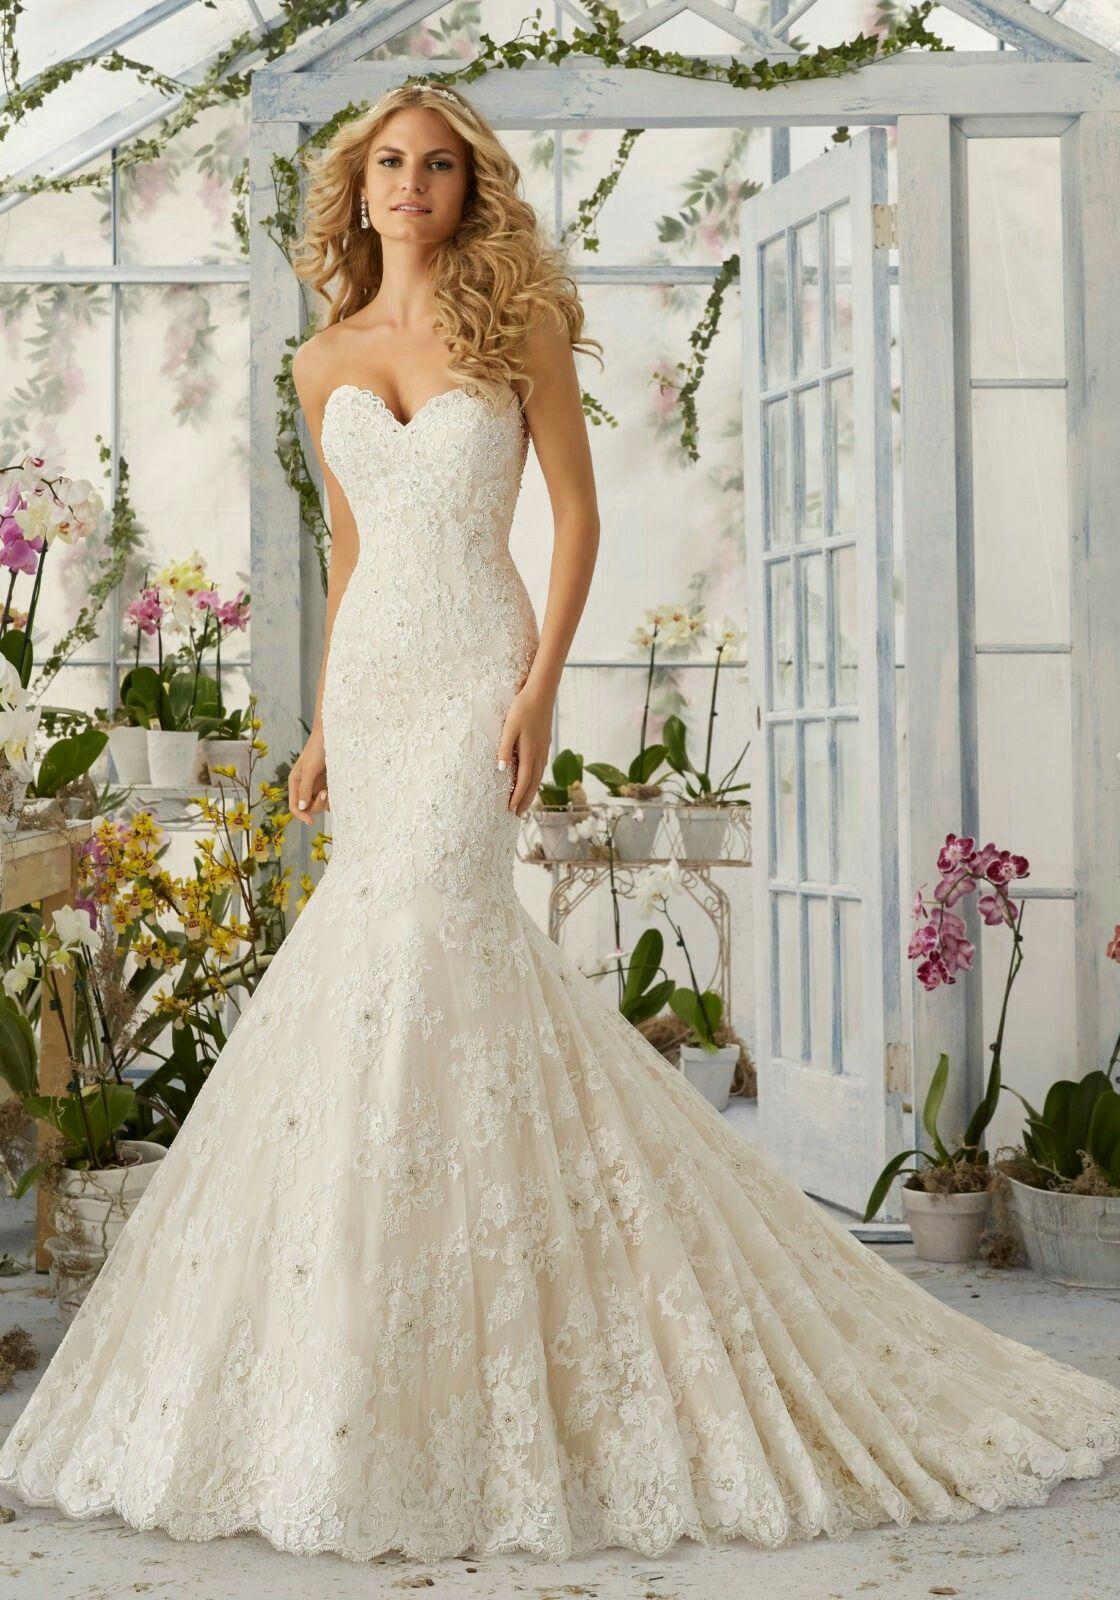 White mermaid wedding dress  Pin by Michelle Haigis on Weddings  Pinterest  Weddings